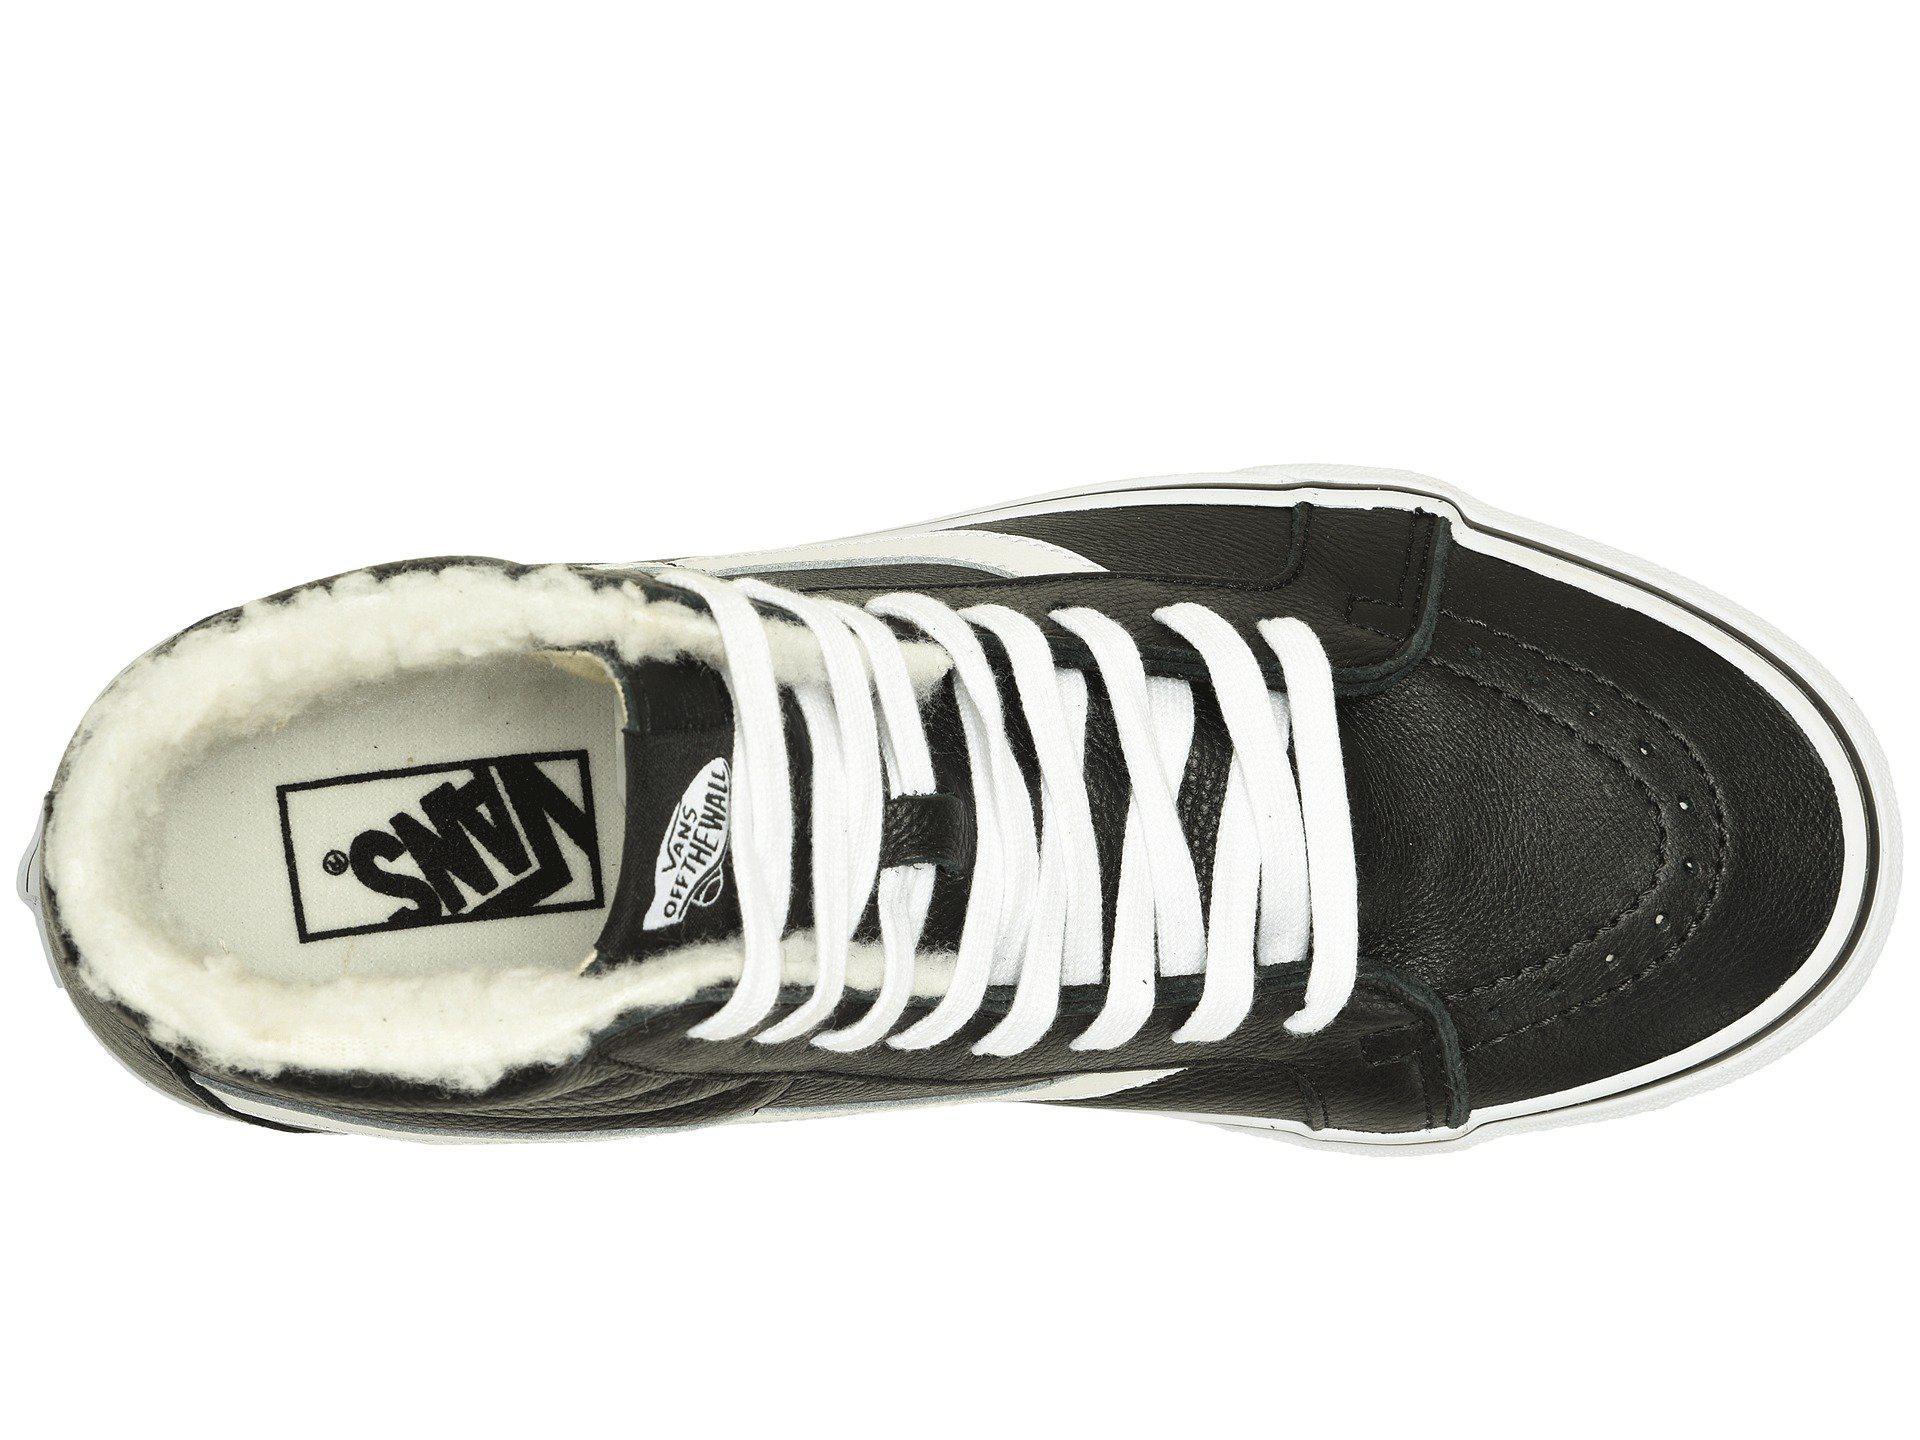 7dfee0c4ae Vans - Sk8-hi Reissue ((leather fleece) Black true White. View fullscreen